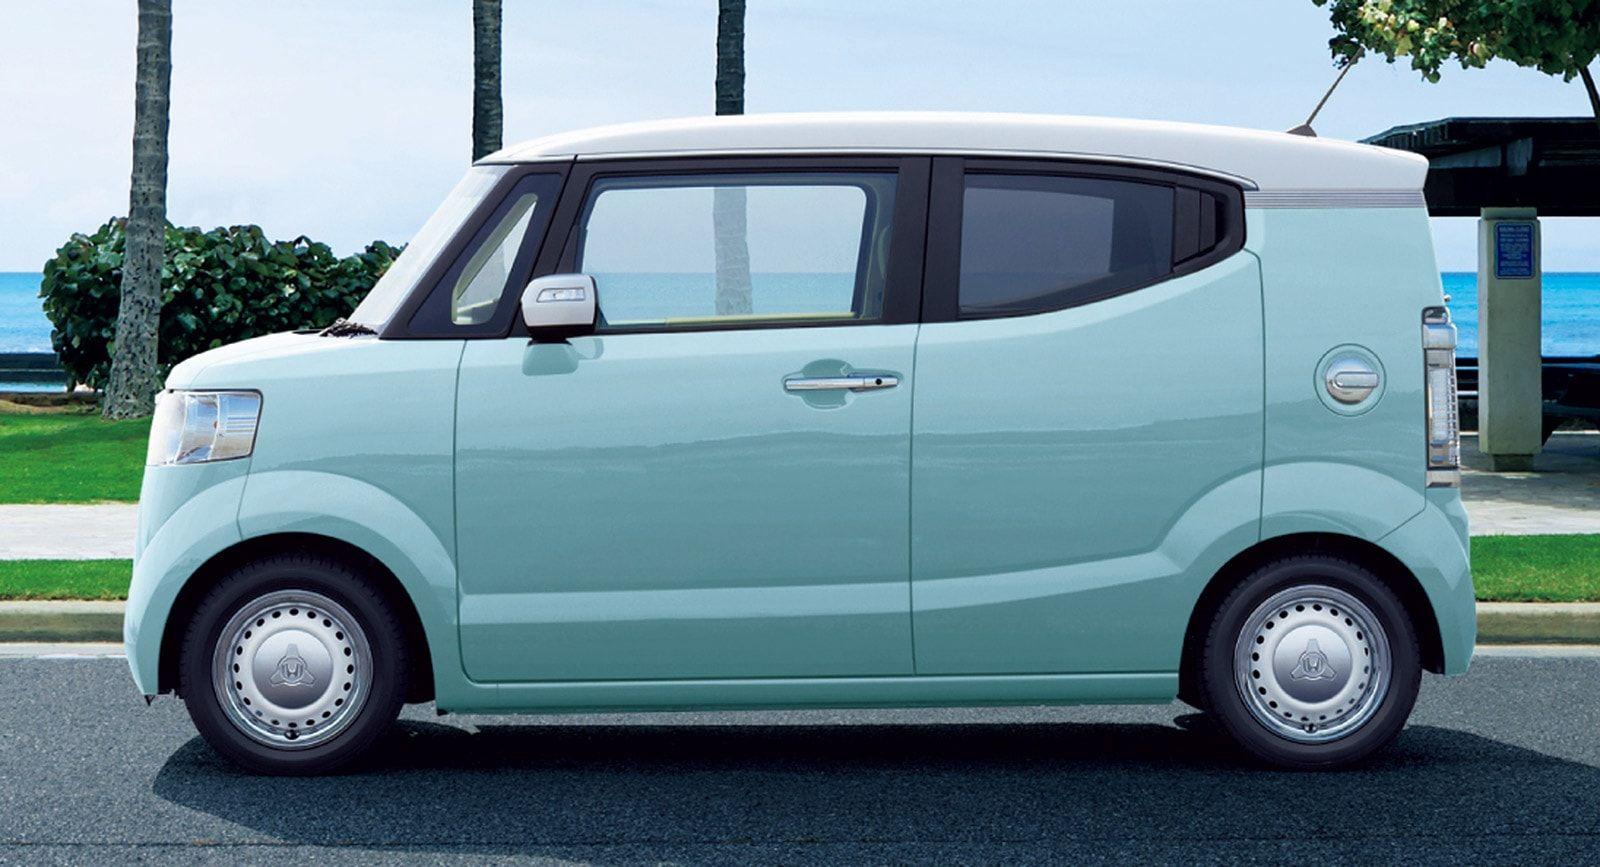 2018 Honda N Box Slash Brings Updates To The Sleekest Of Kei Cars